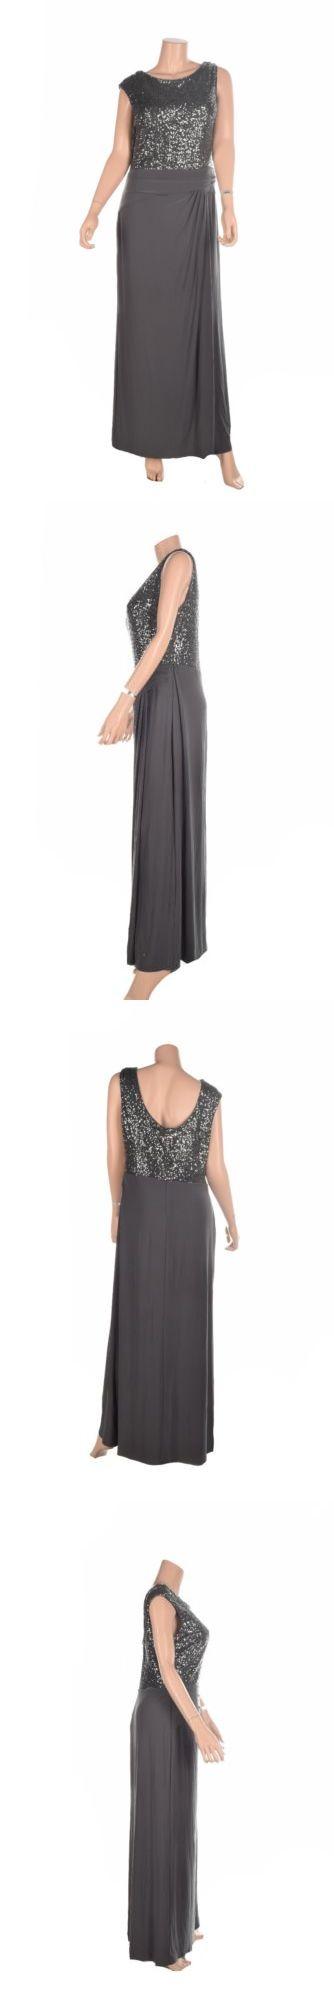 Dresses 175784: Lauren Ralph Lauren Petite Sequined Cap-Sleeve Dre Mercury  16 -\u003e